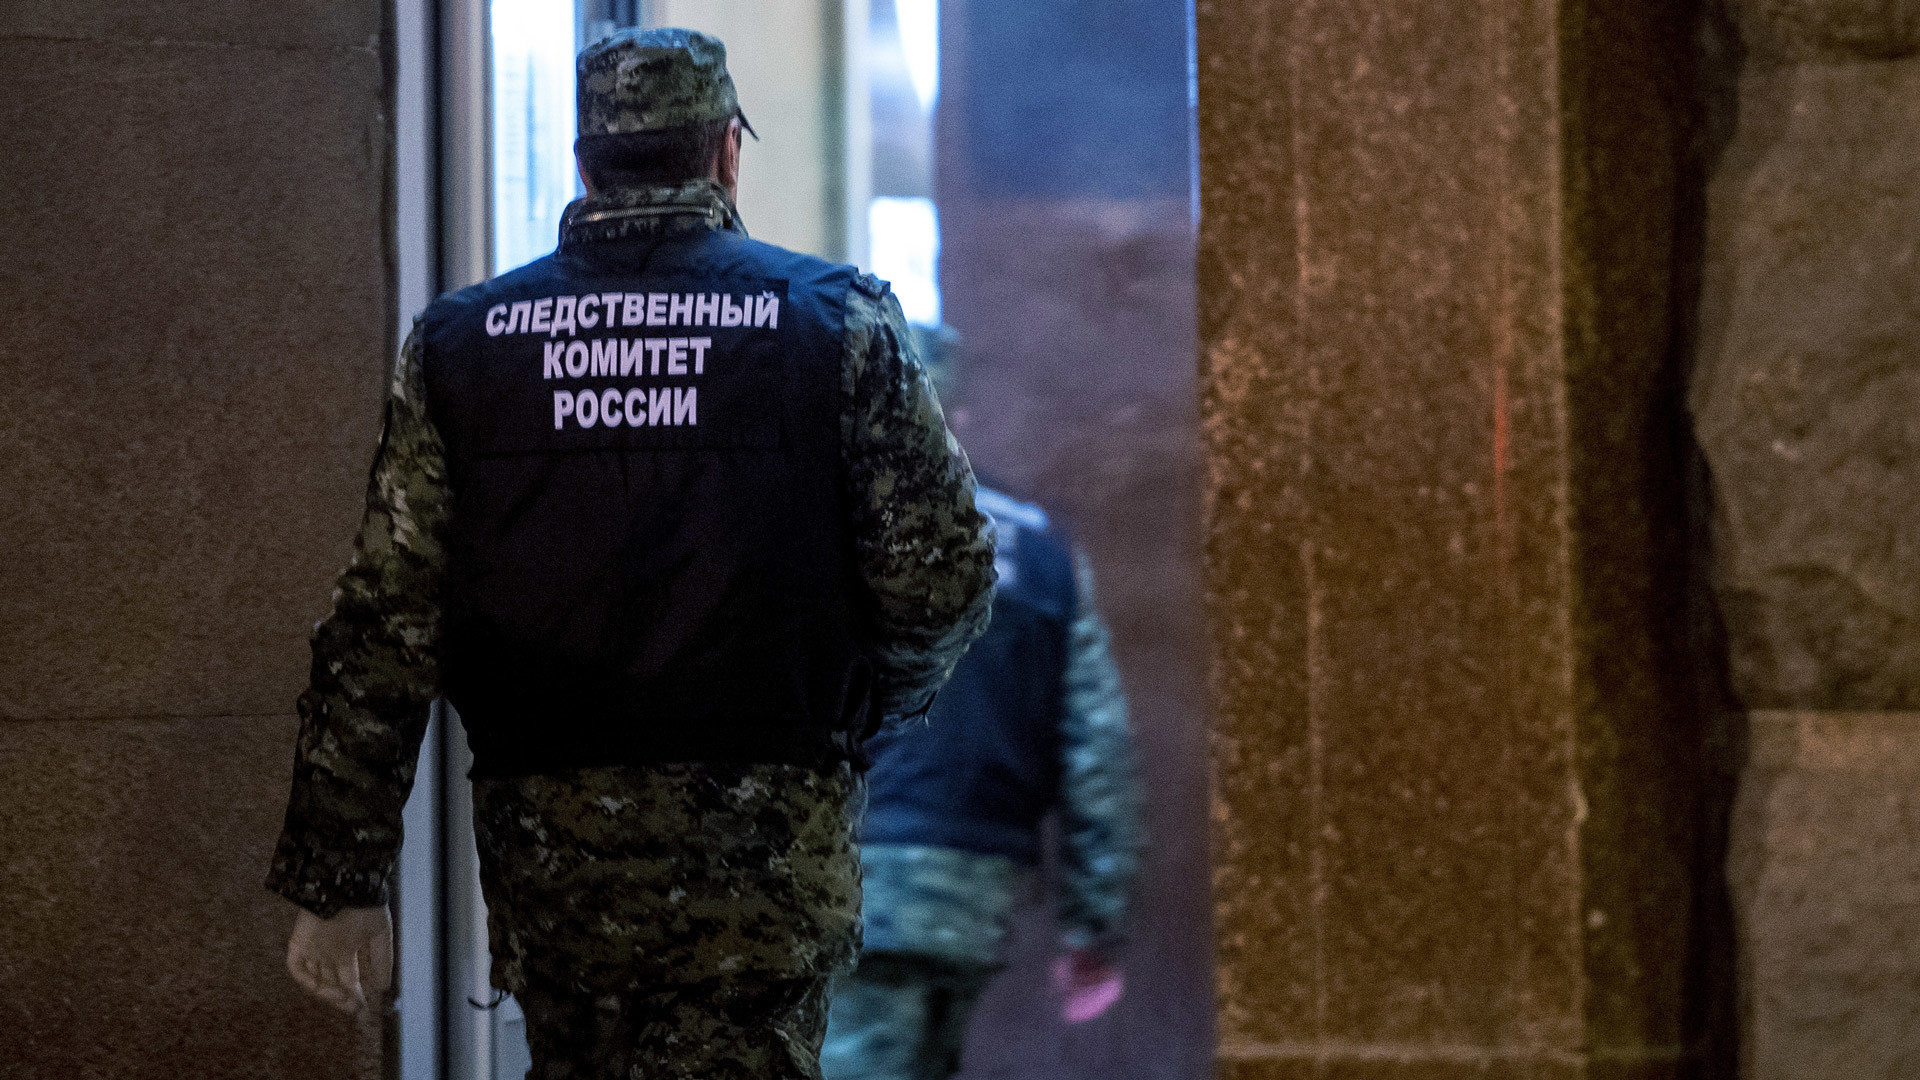 Фото: © РИА Новости/Алексей Даничев